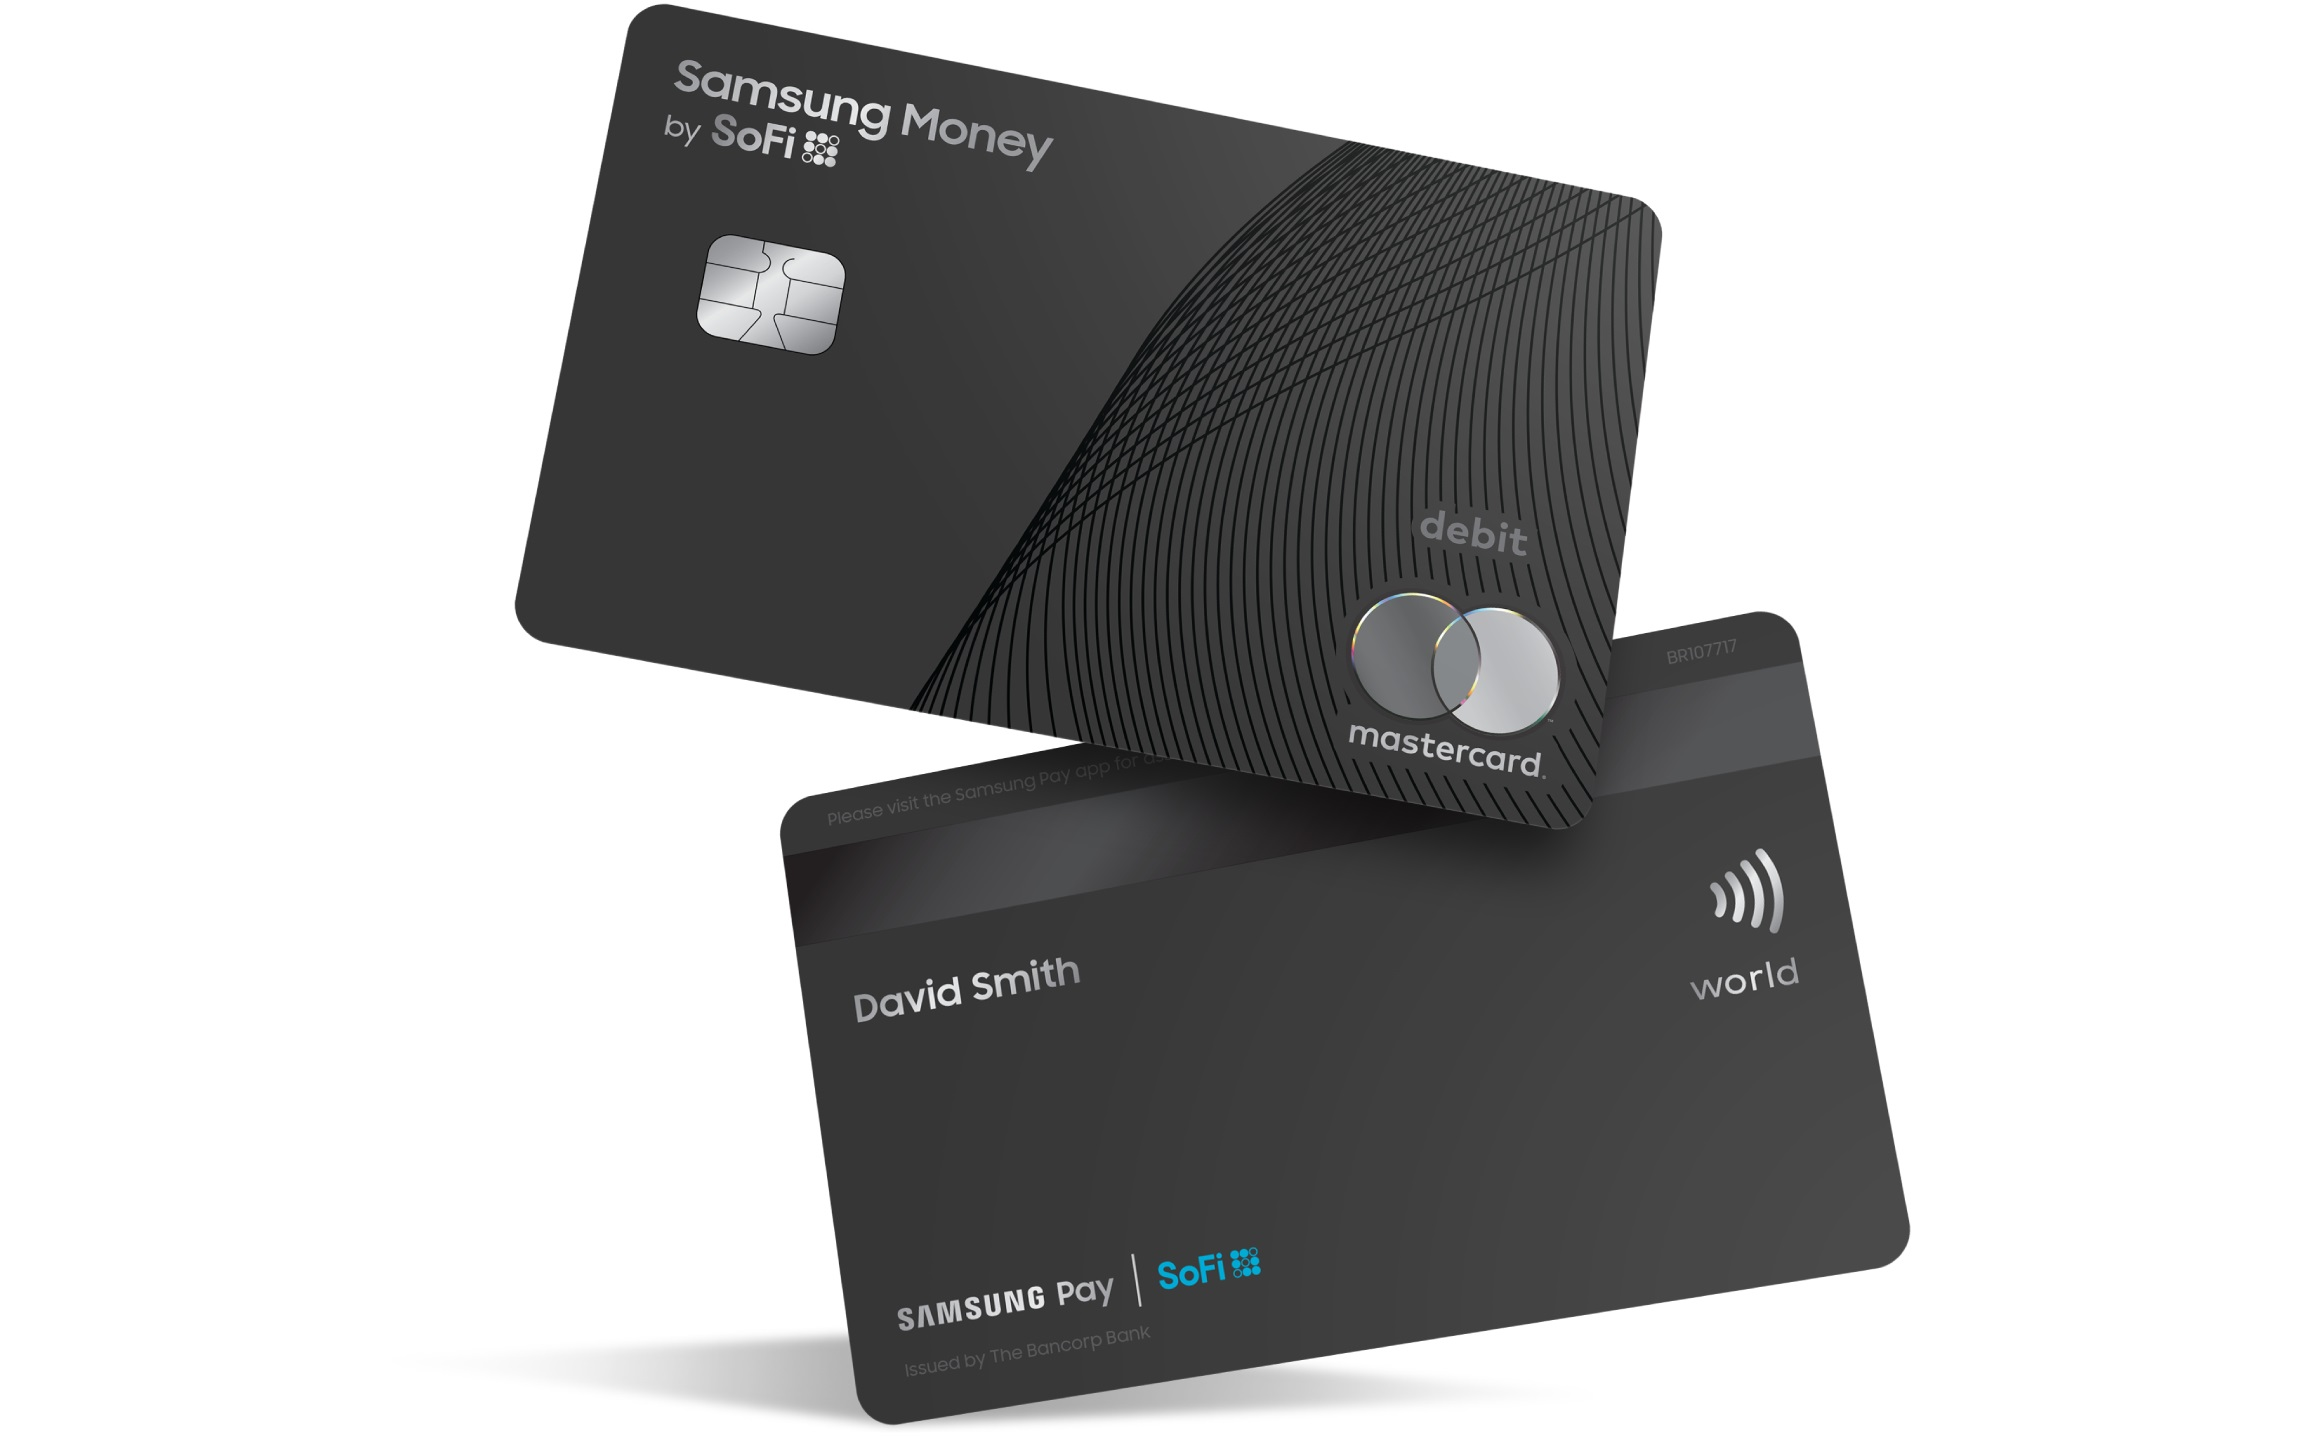 Samsung Money by SoFi debit card